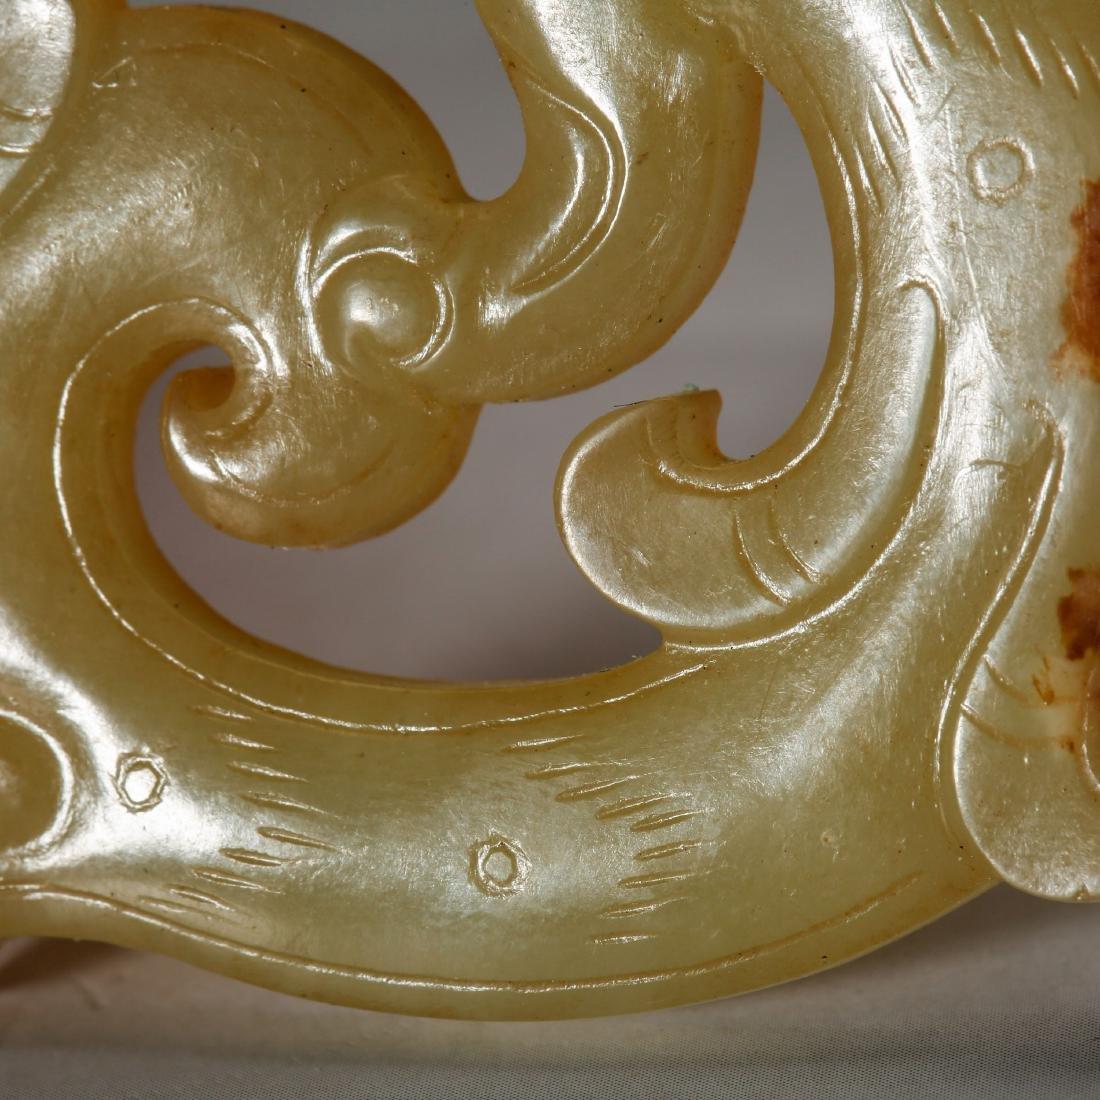 CHINESE ARCHAIC JADE PENDANT, HAN DYNASTY - 6